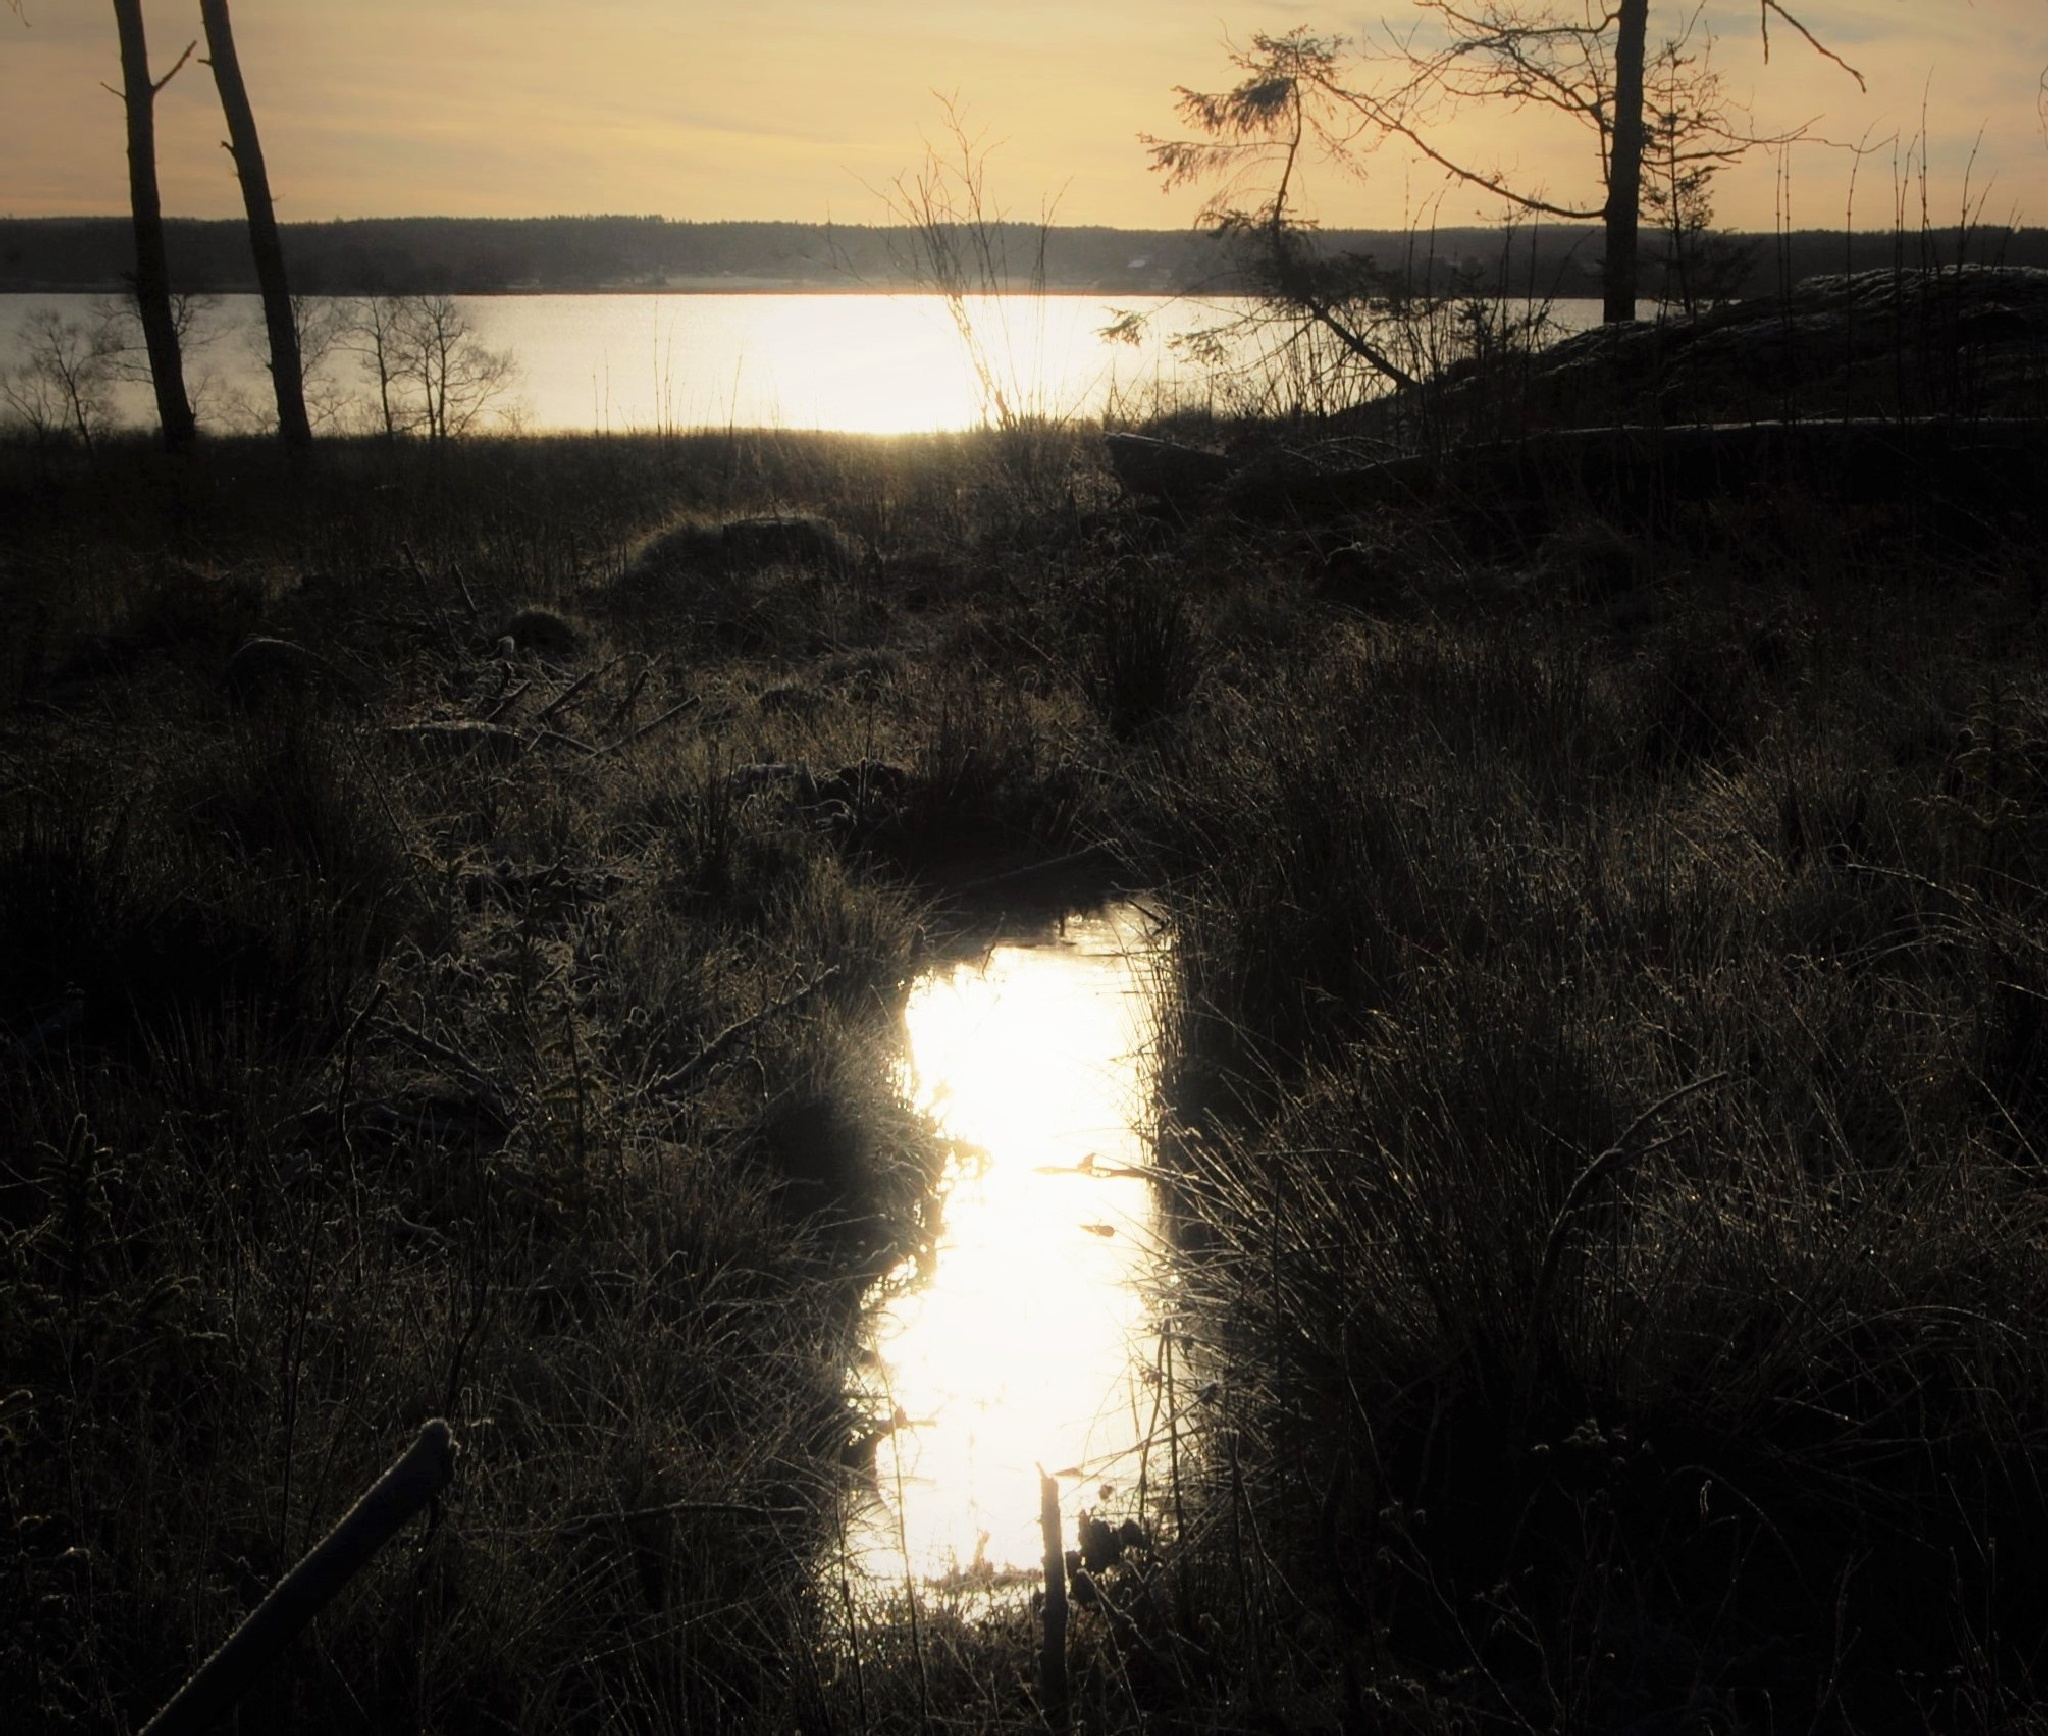 Reflexion of the afternoon sun by lillemor.ekstrom ek